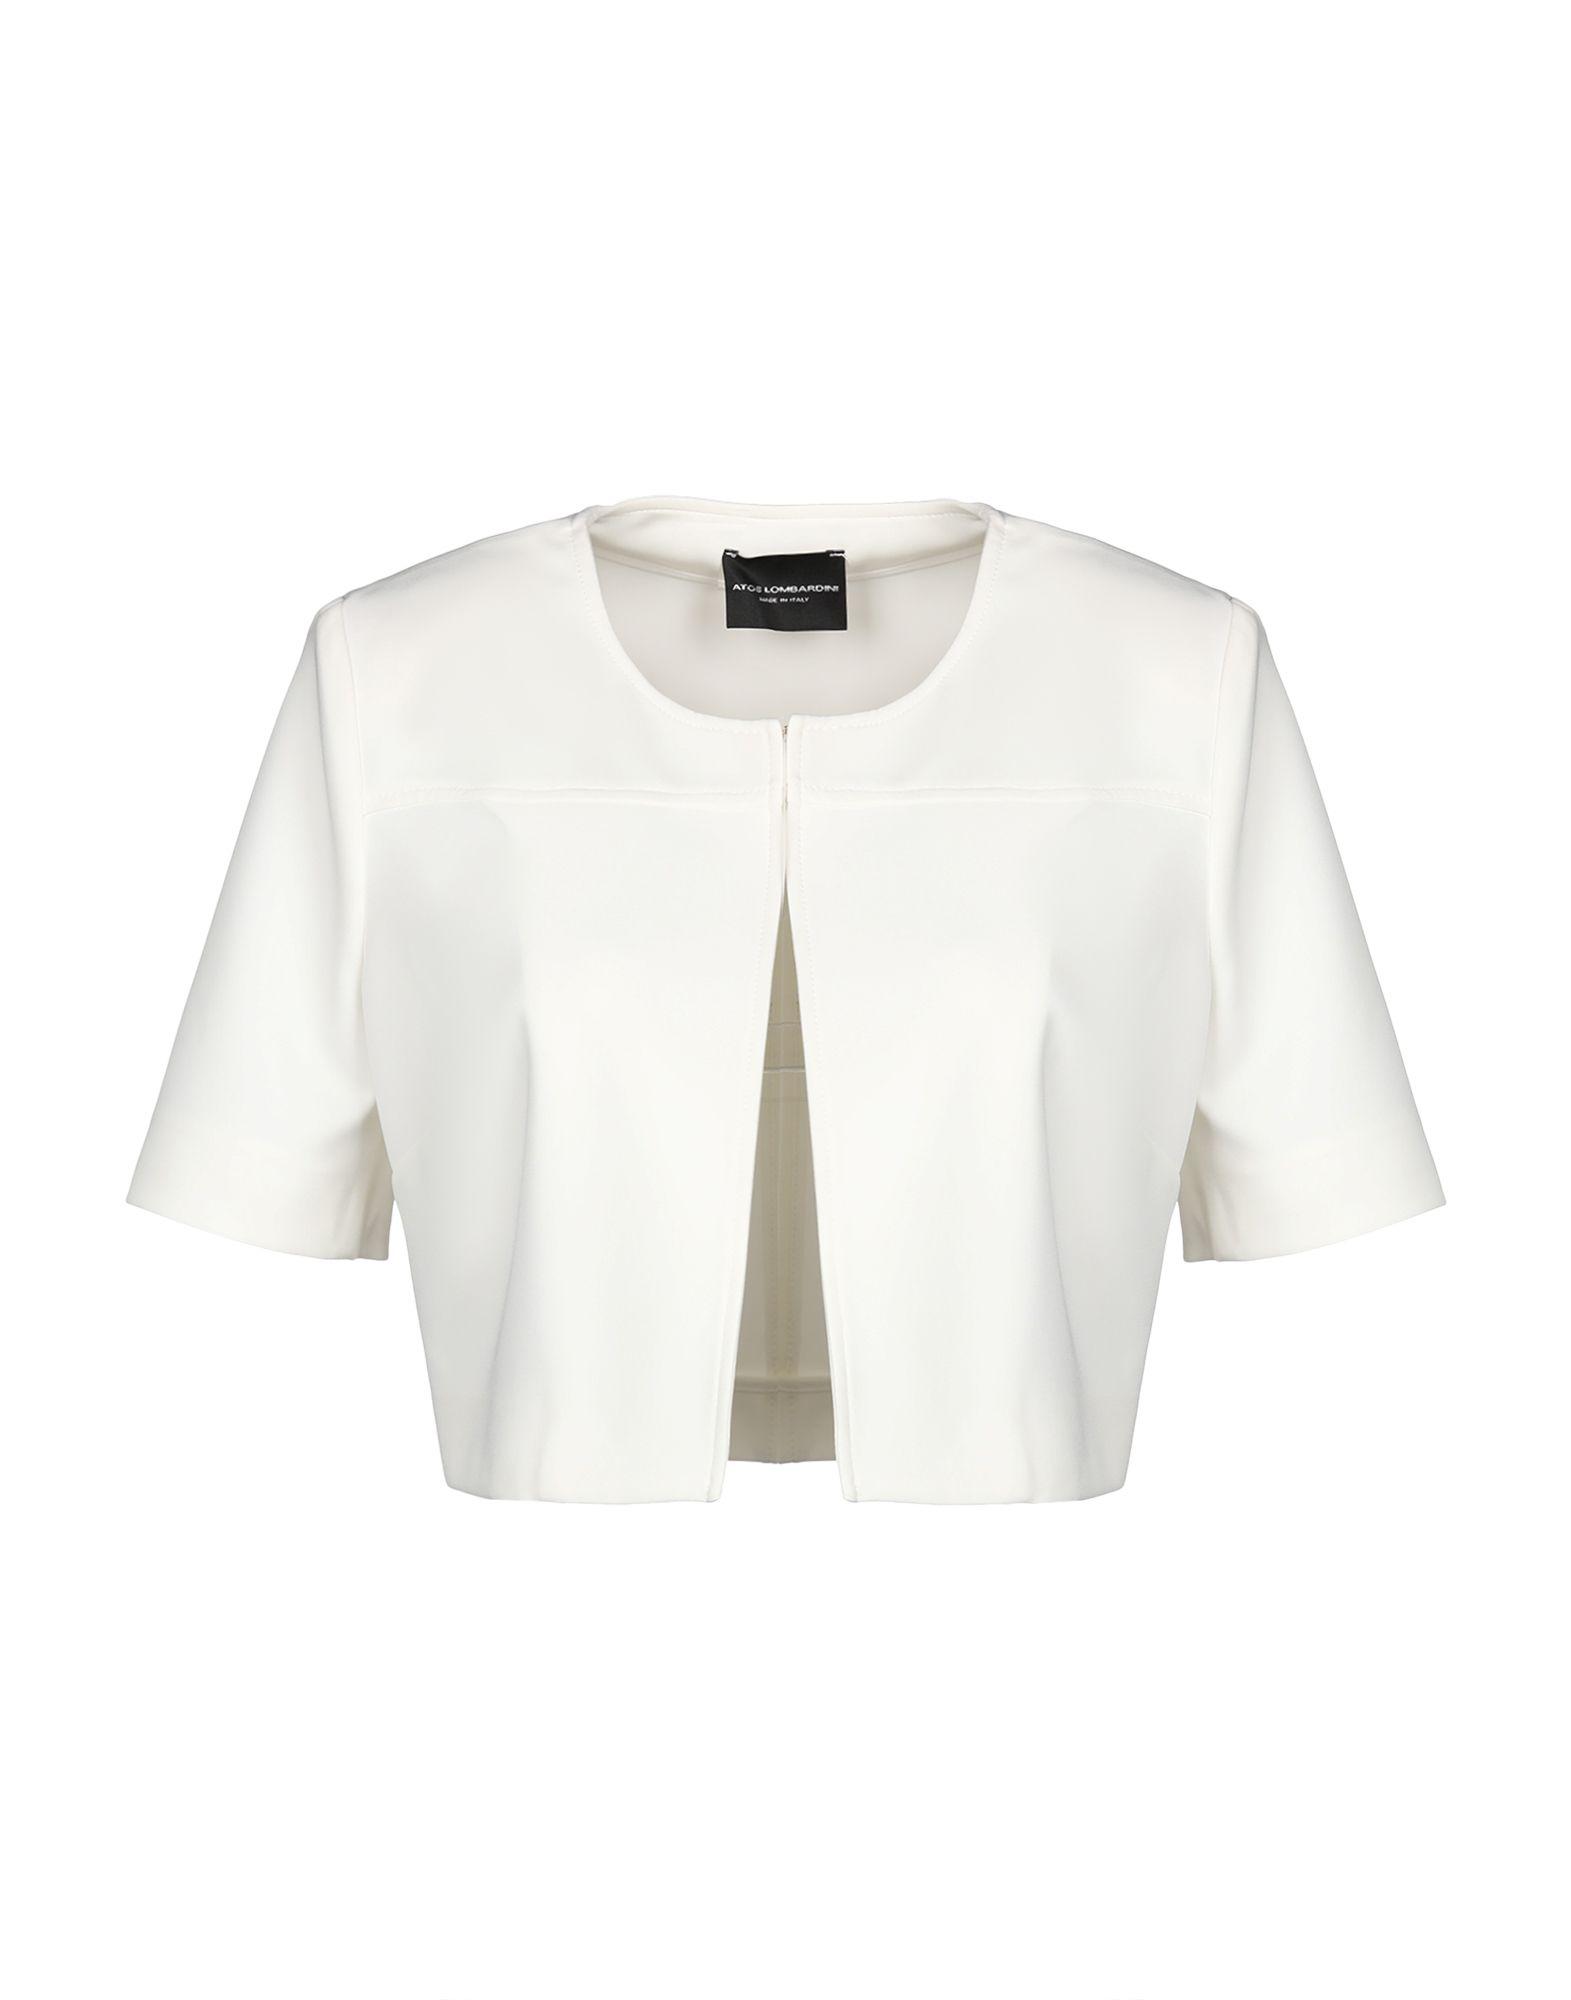 ATOS LOMBARDINI Blazers in White